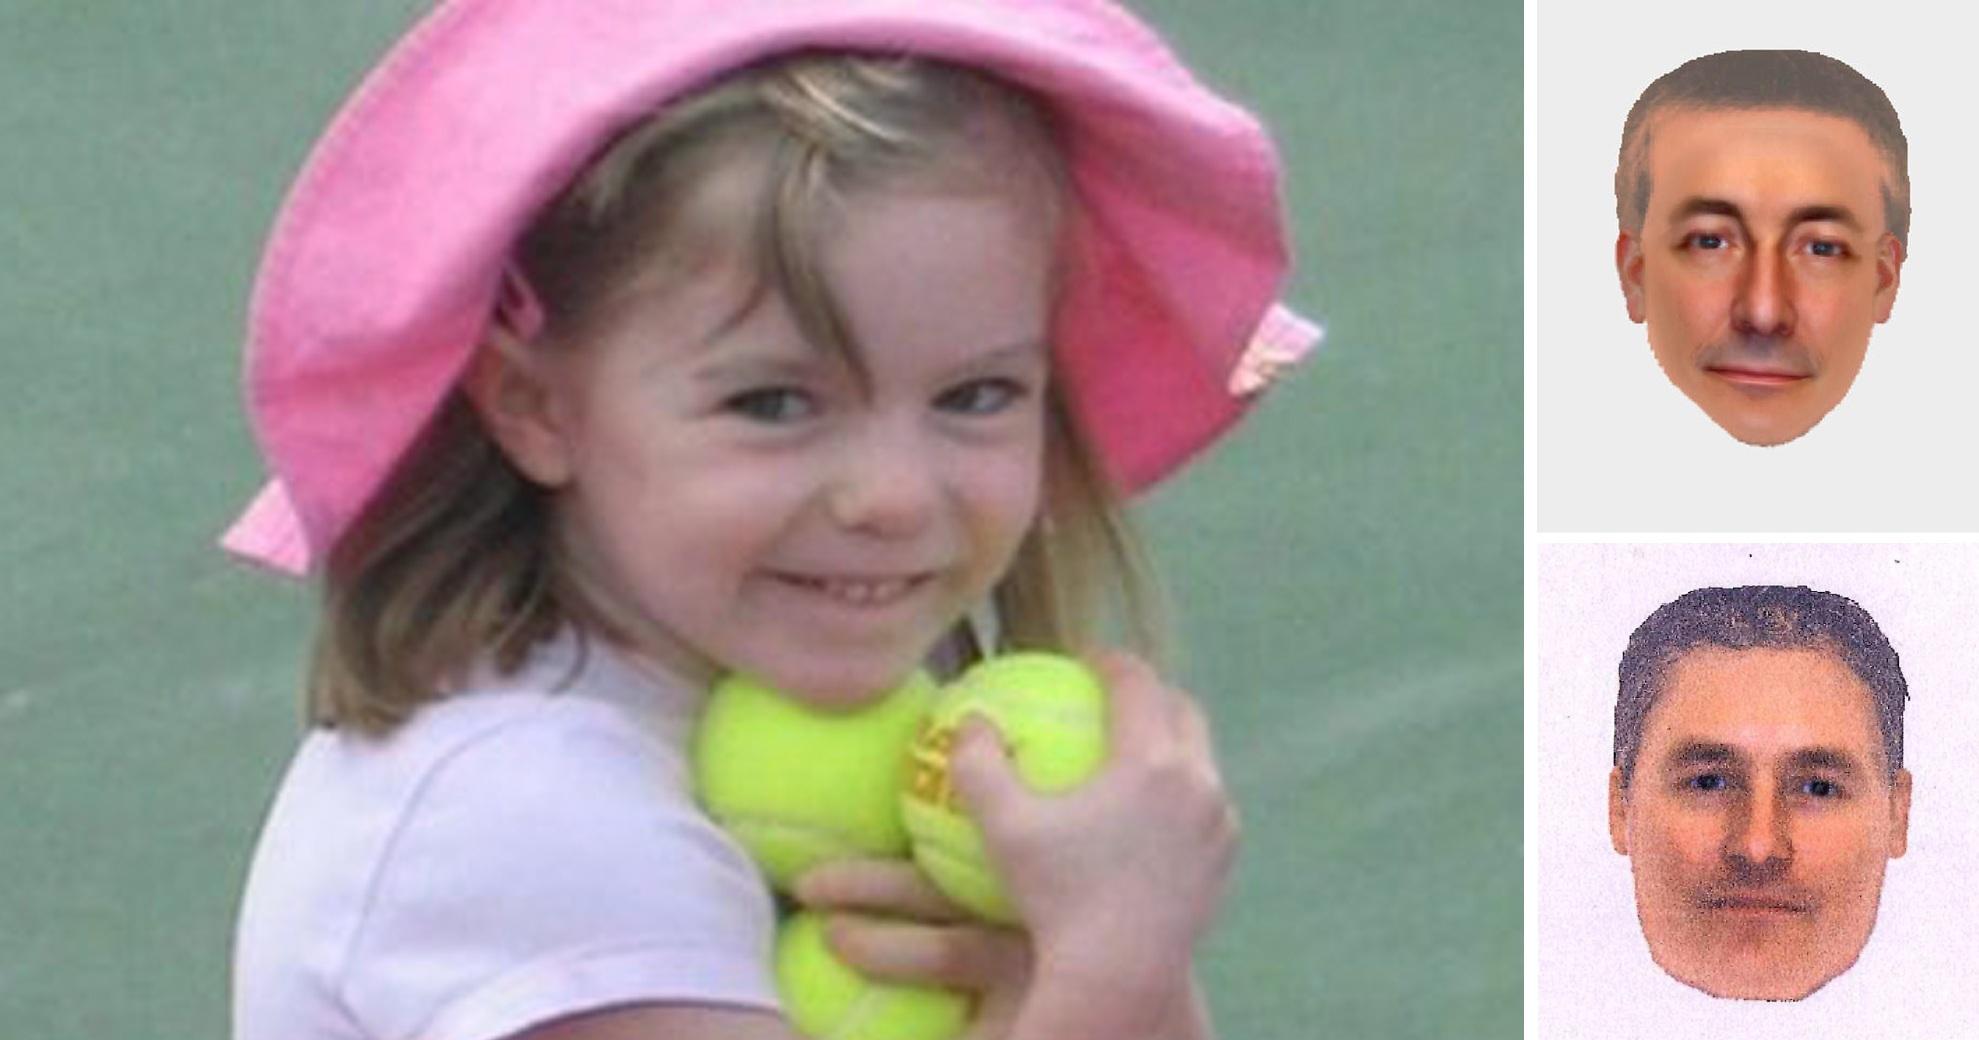 Madeleine McCann: Police seek 'man carrying blonde child'